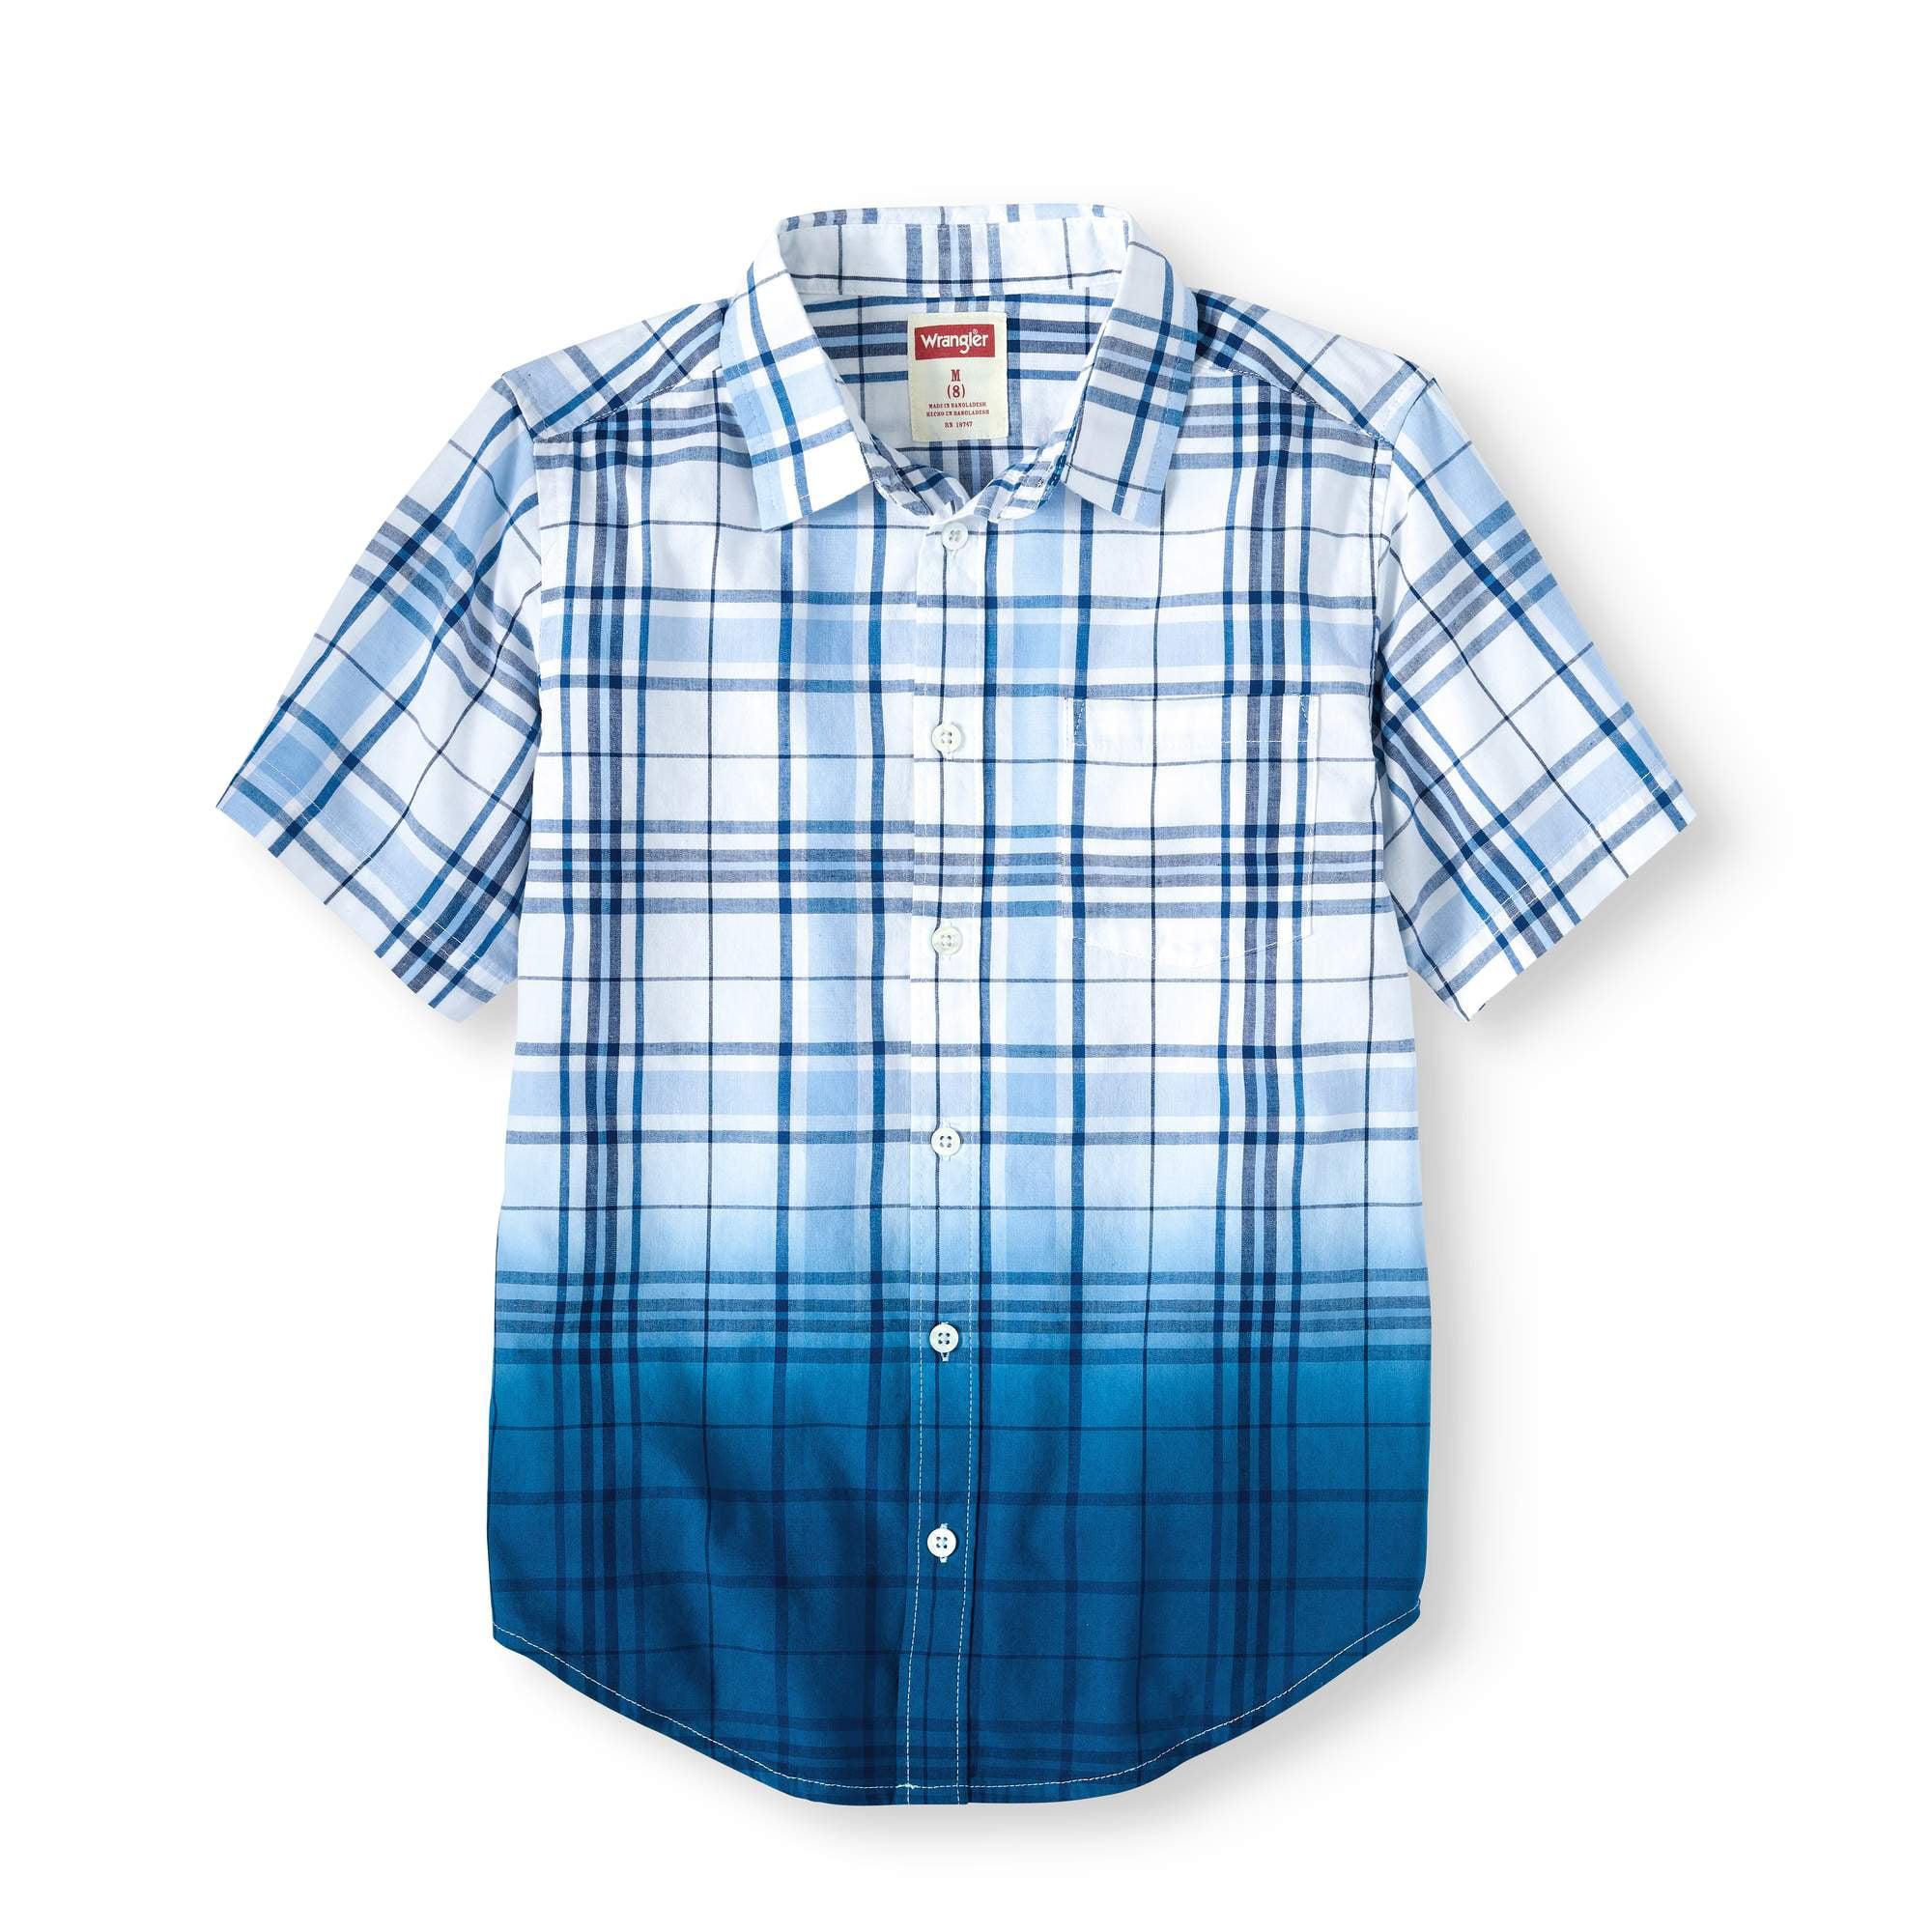 Boys' Short Sleeve Plaid Button Up Top